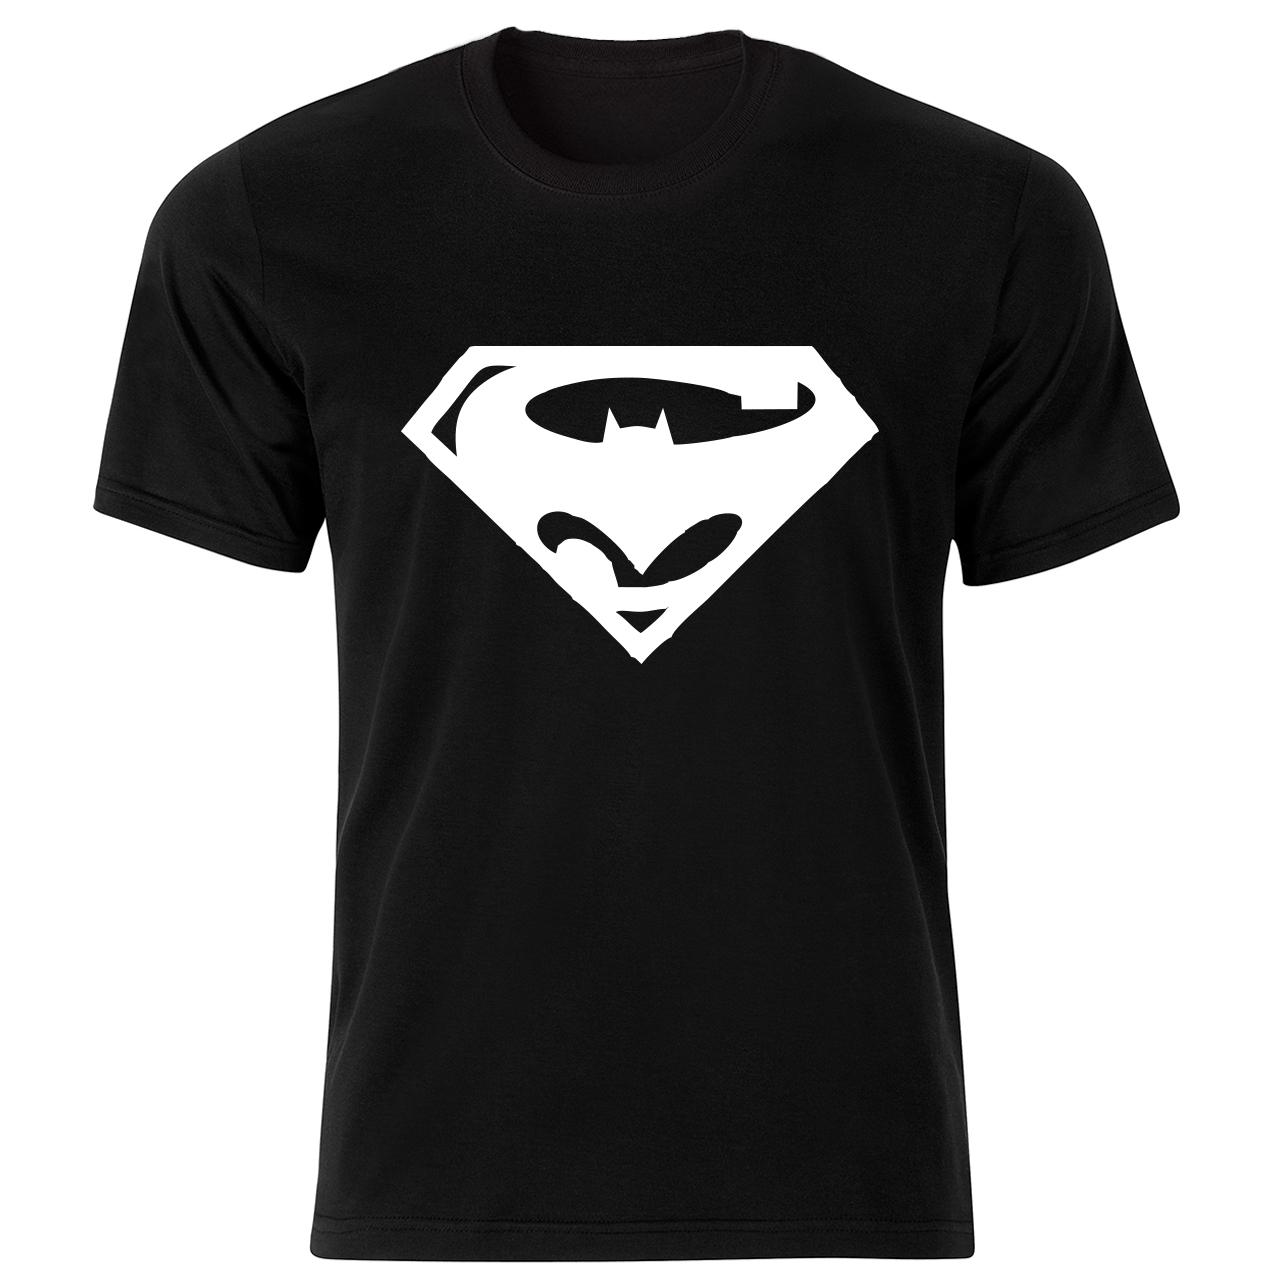 تی شرت زنانه طرح بتمن کد 132 |